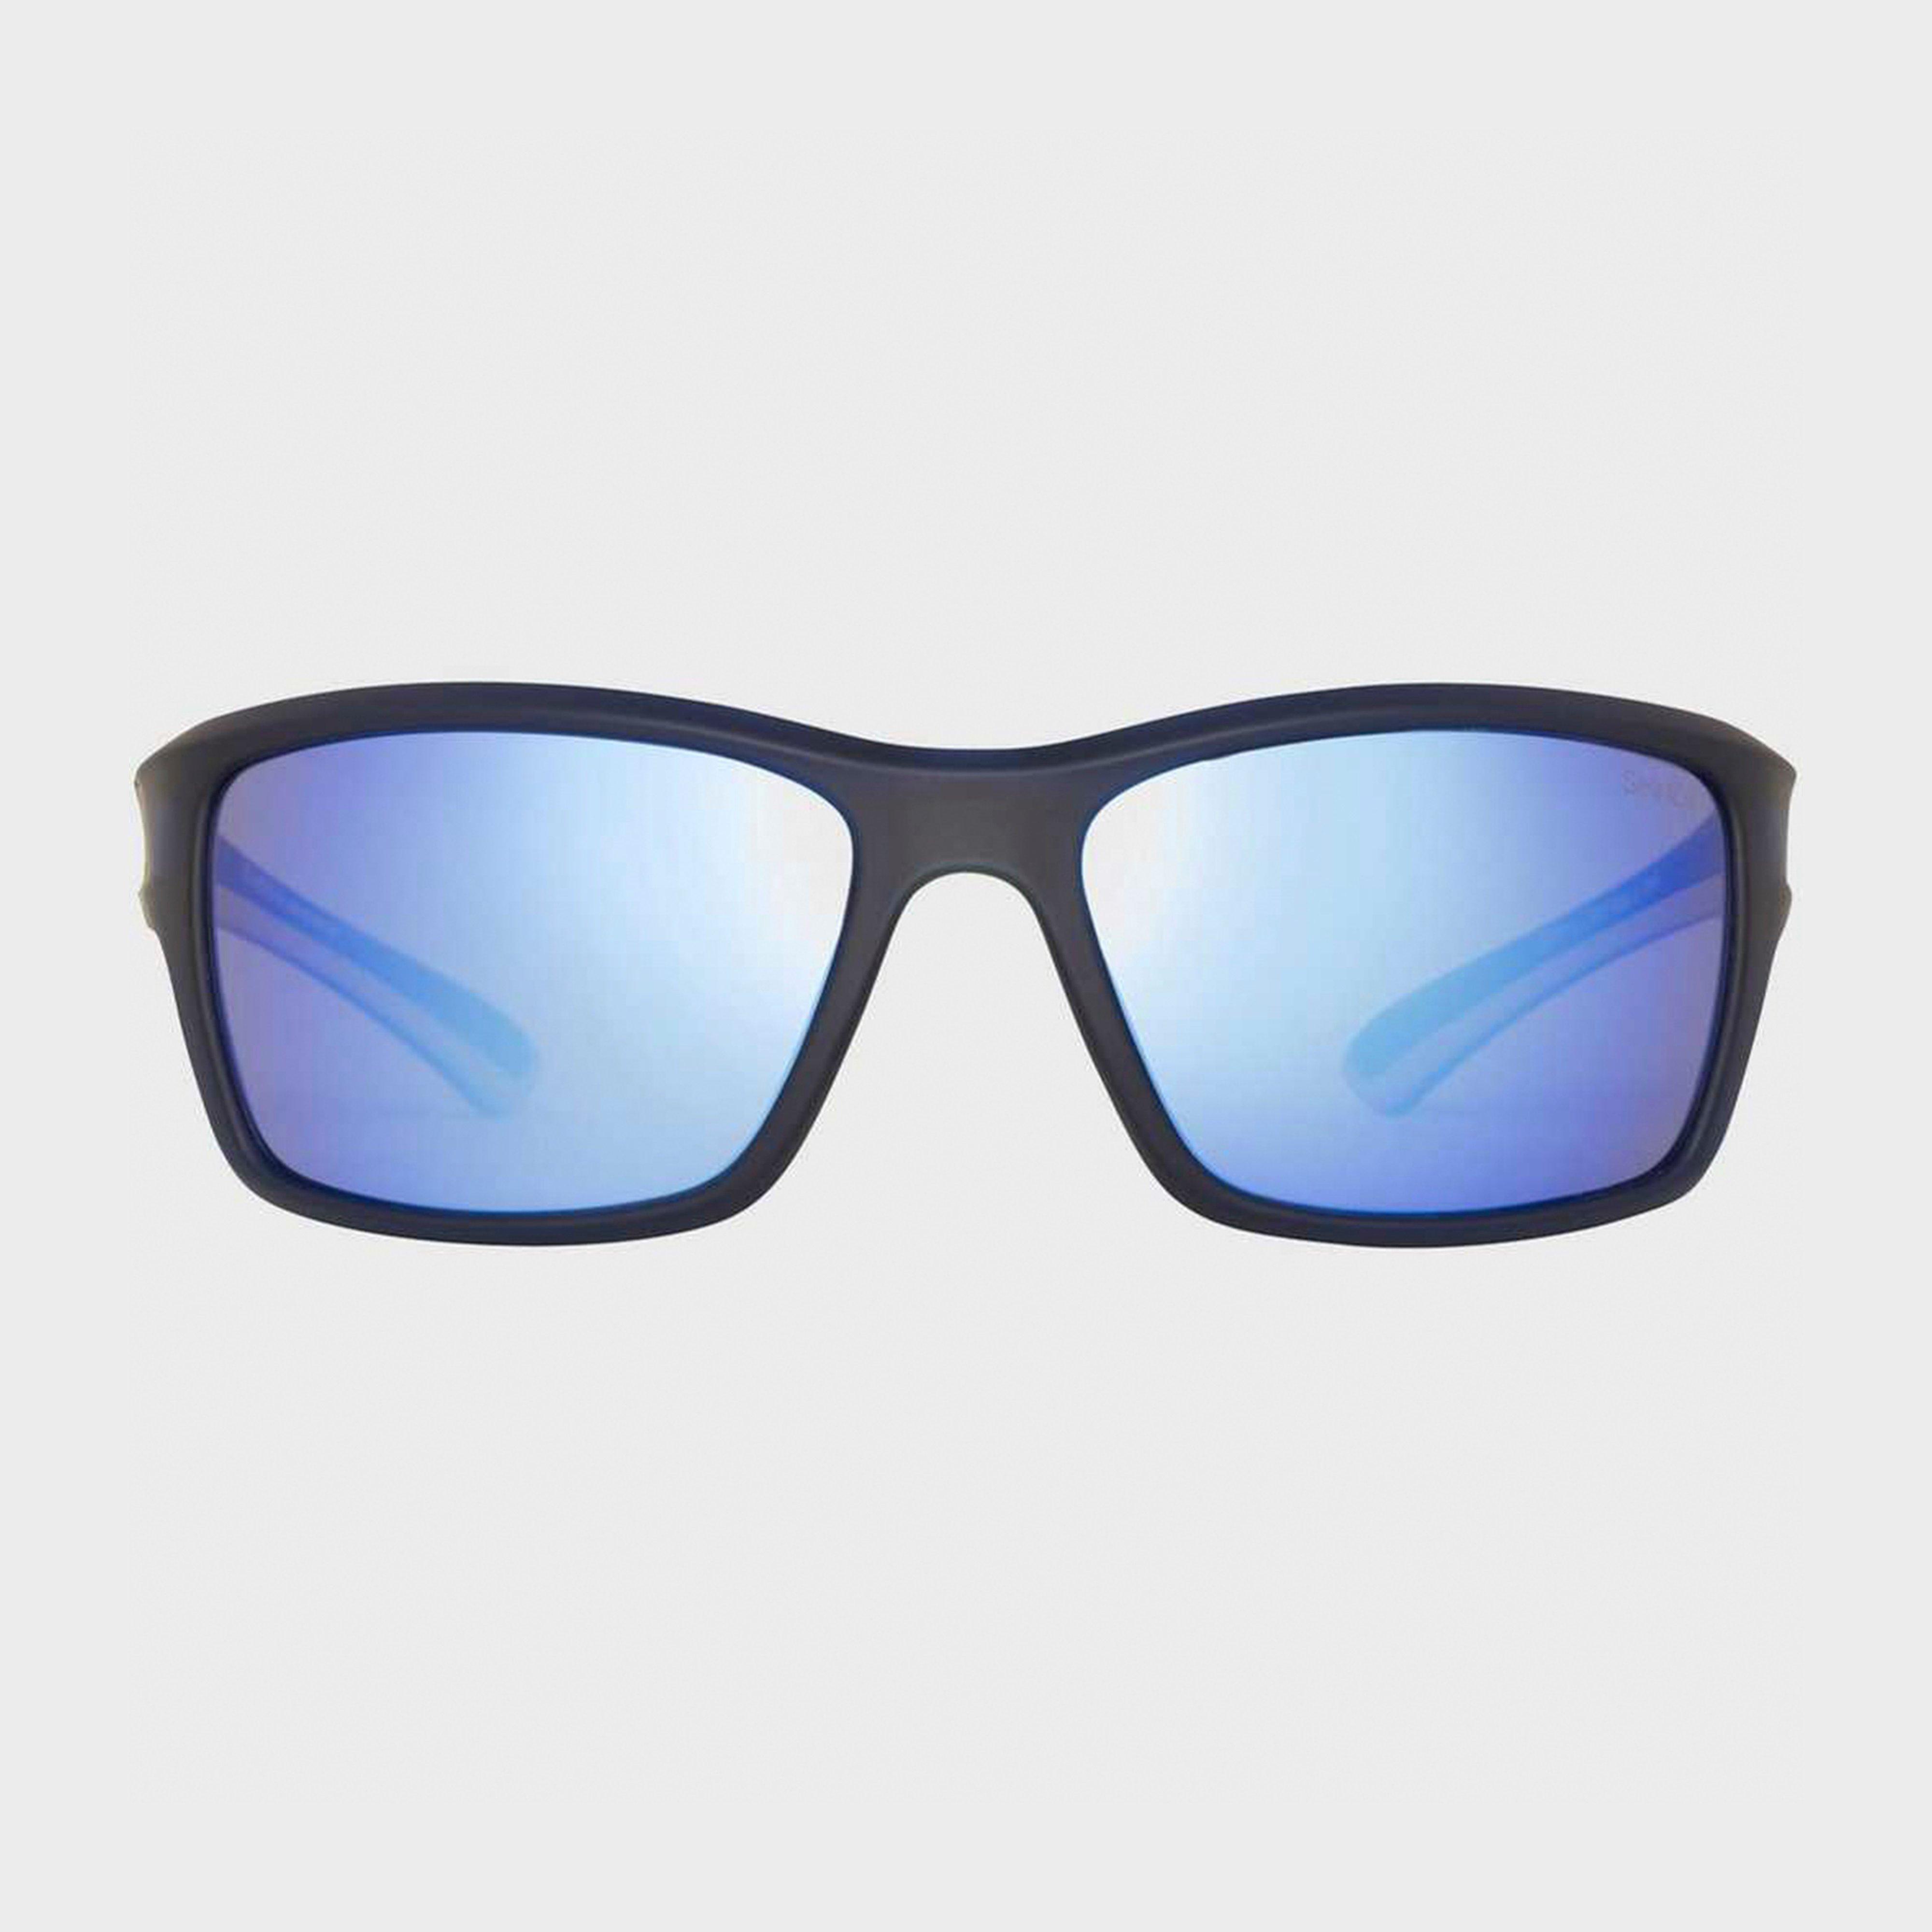 Sinner Sinner Cayo Sunglasses, Blue